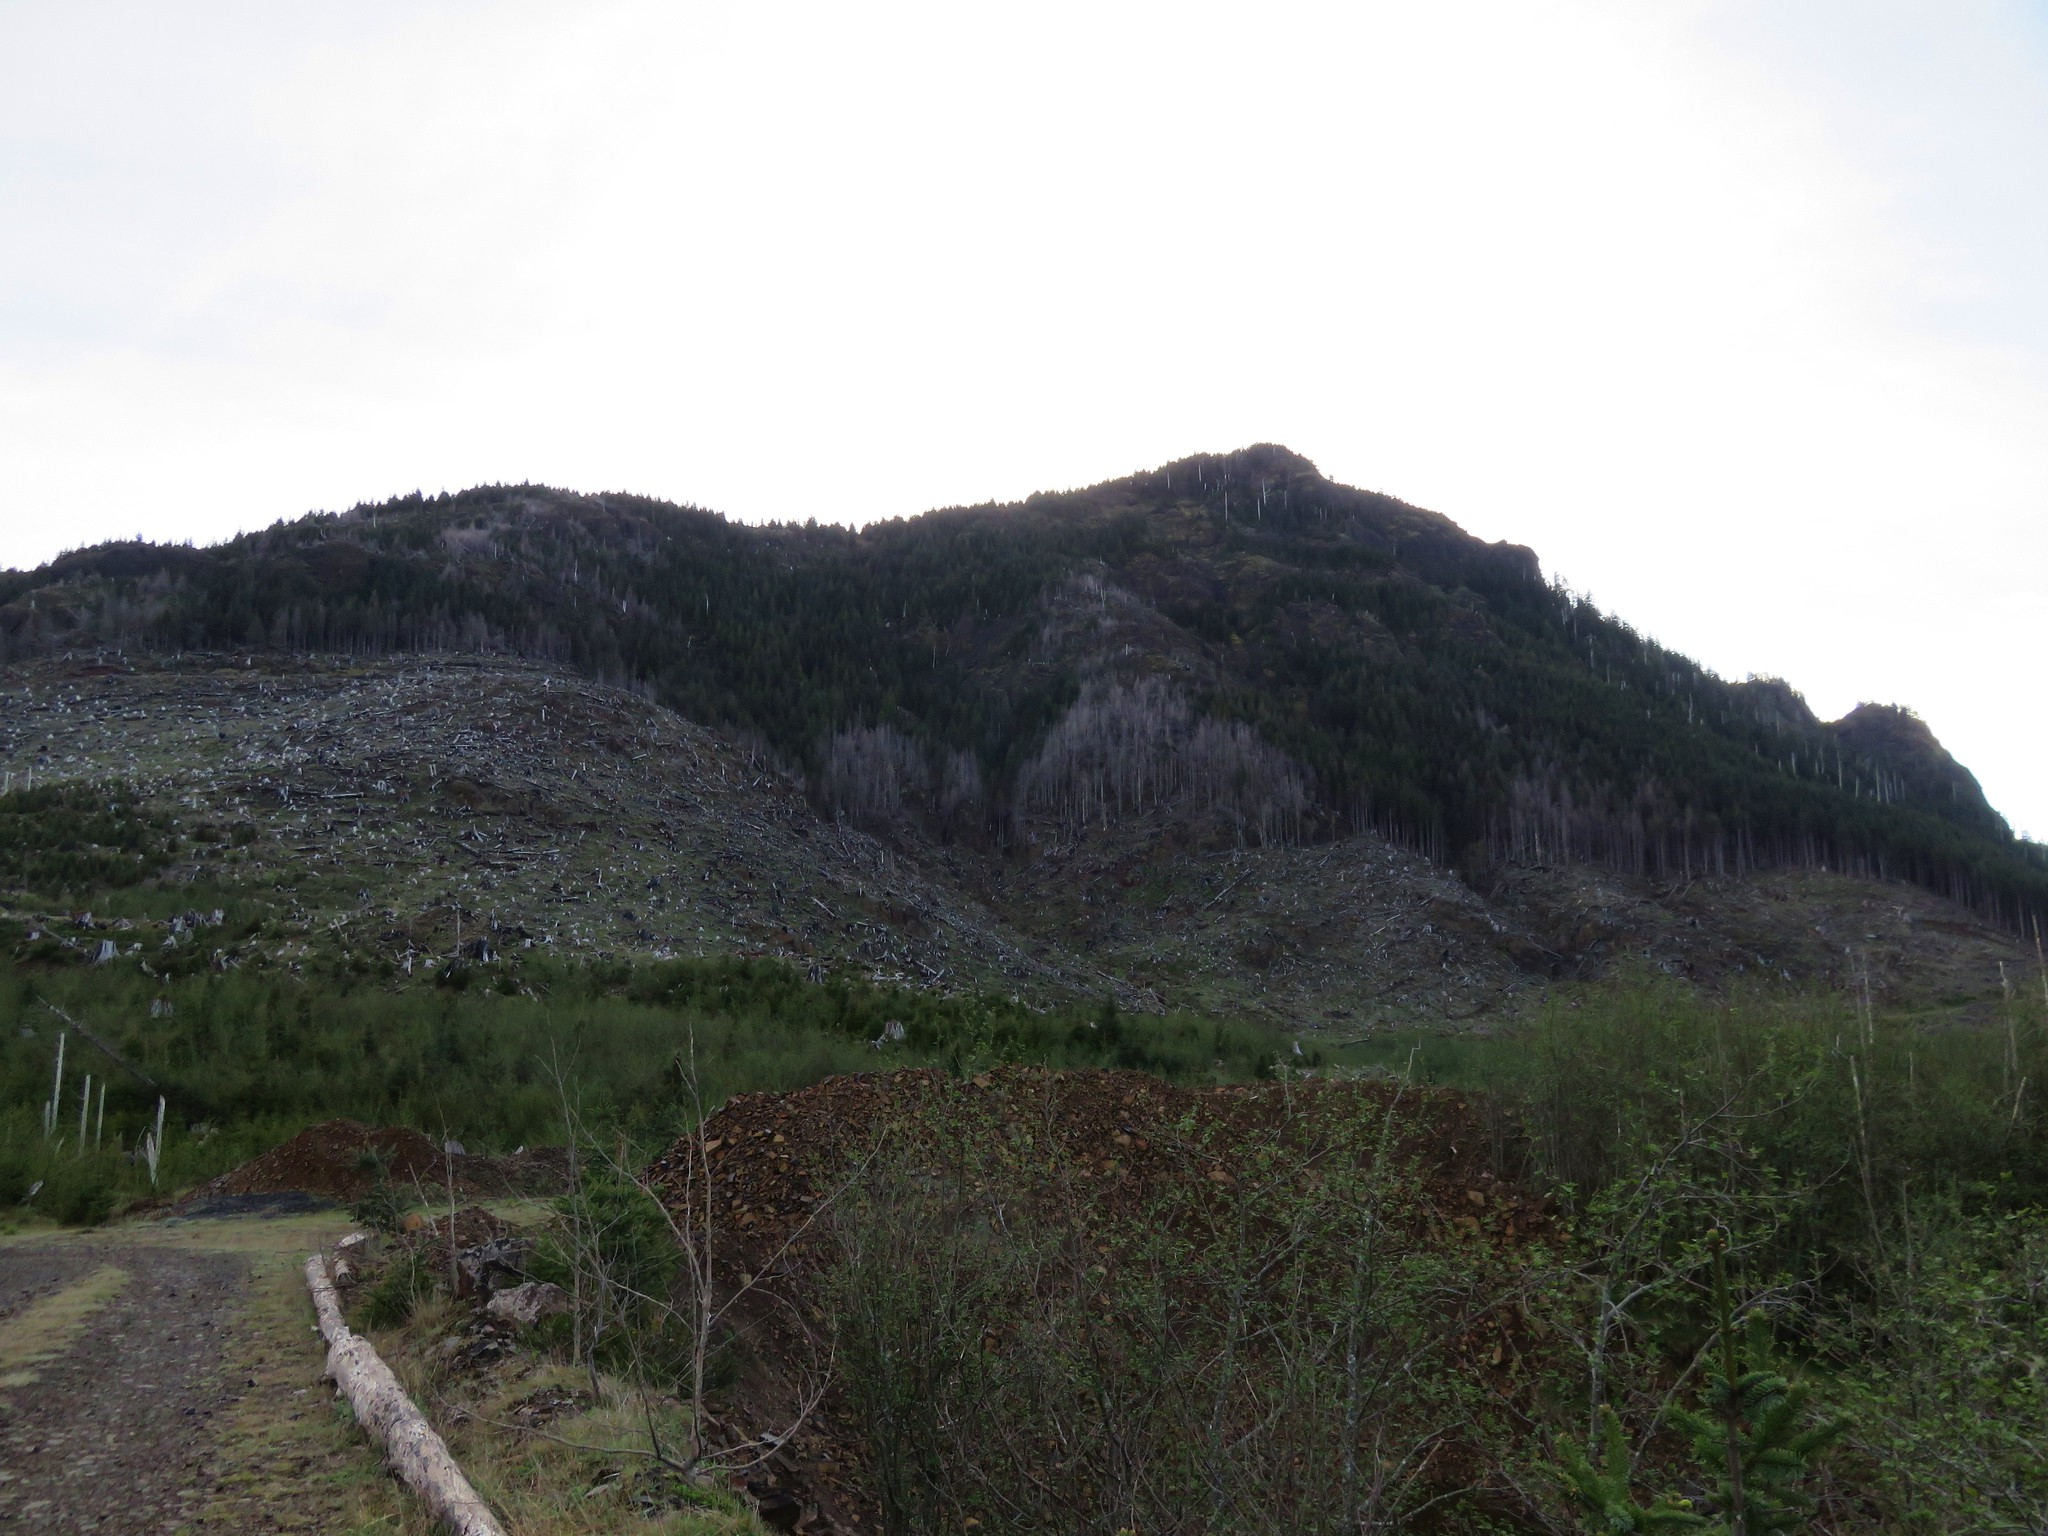 Quarry on the way to Angora Peak